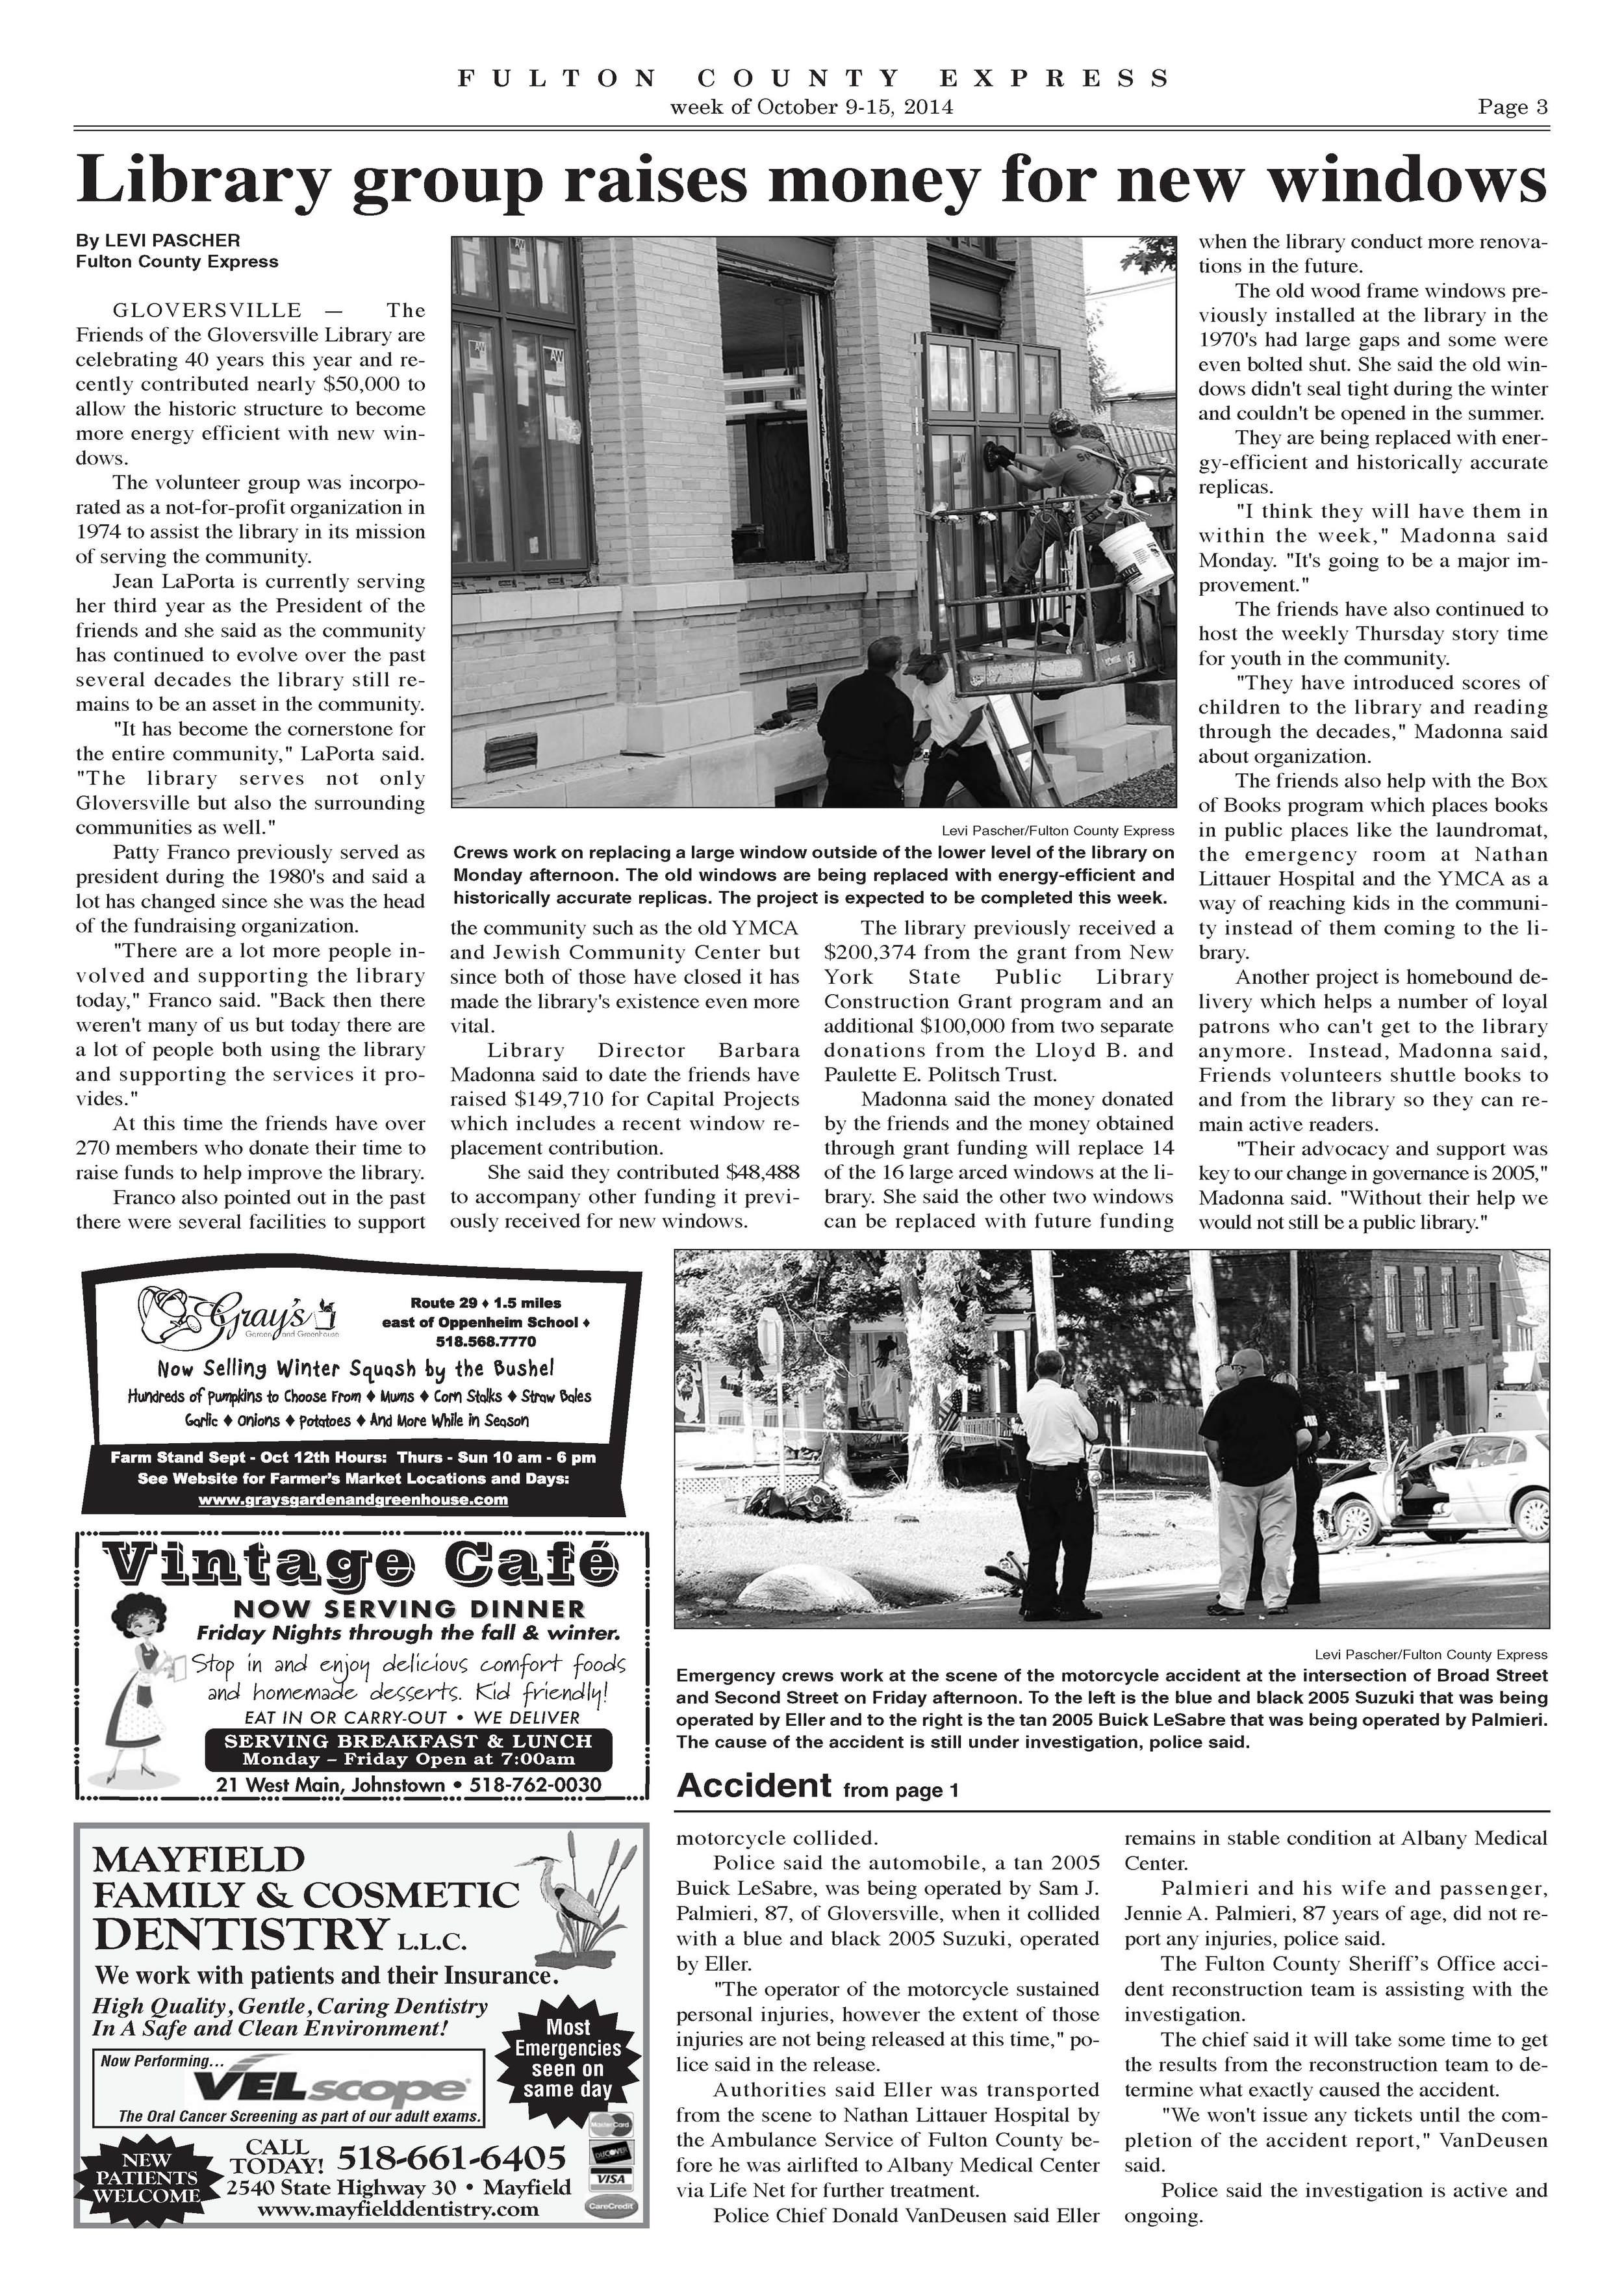 10092014 Fulton County Express windows_Page_2.jpg